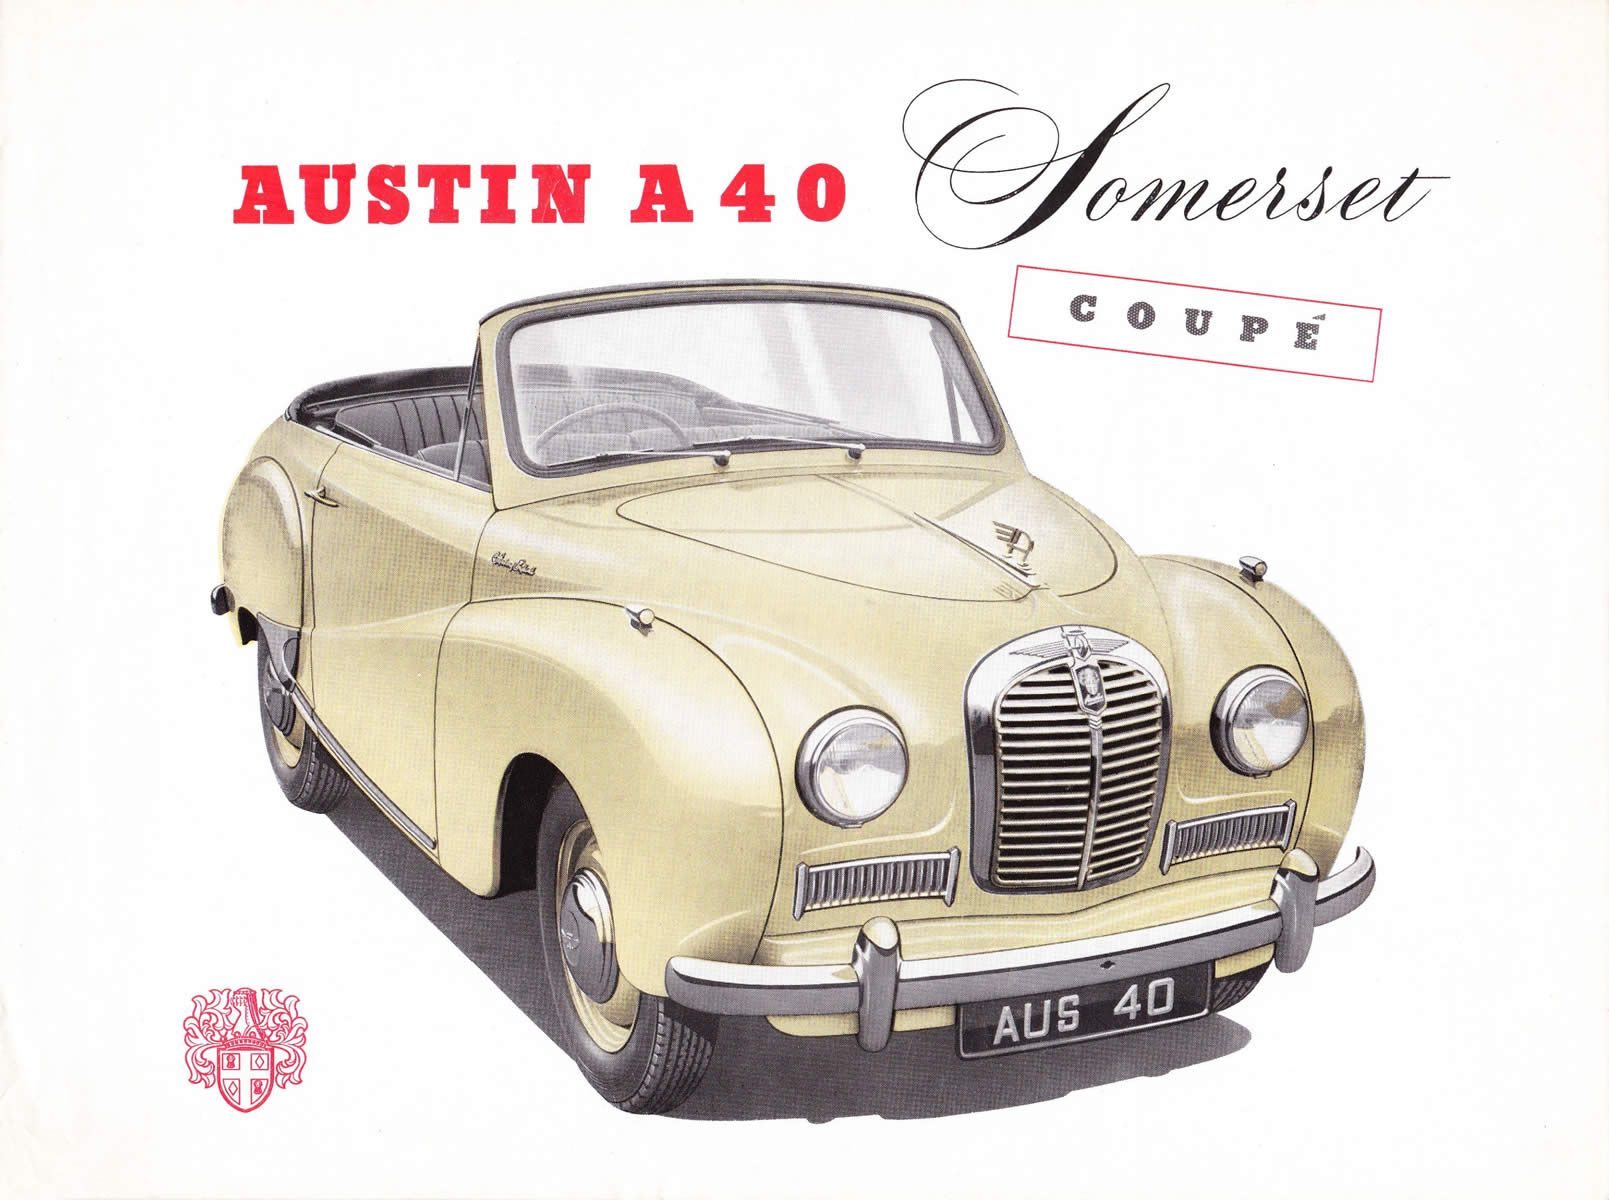 Austin A40 Somerset Coupe 1952 Vintage Car Ads Board 2